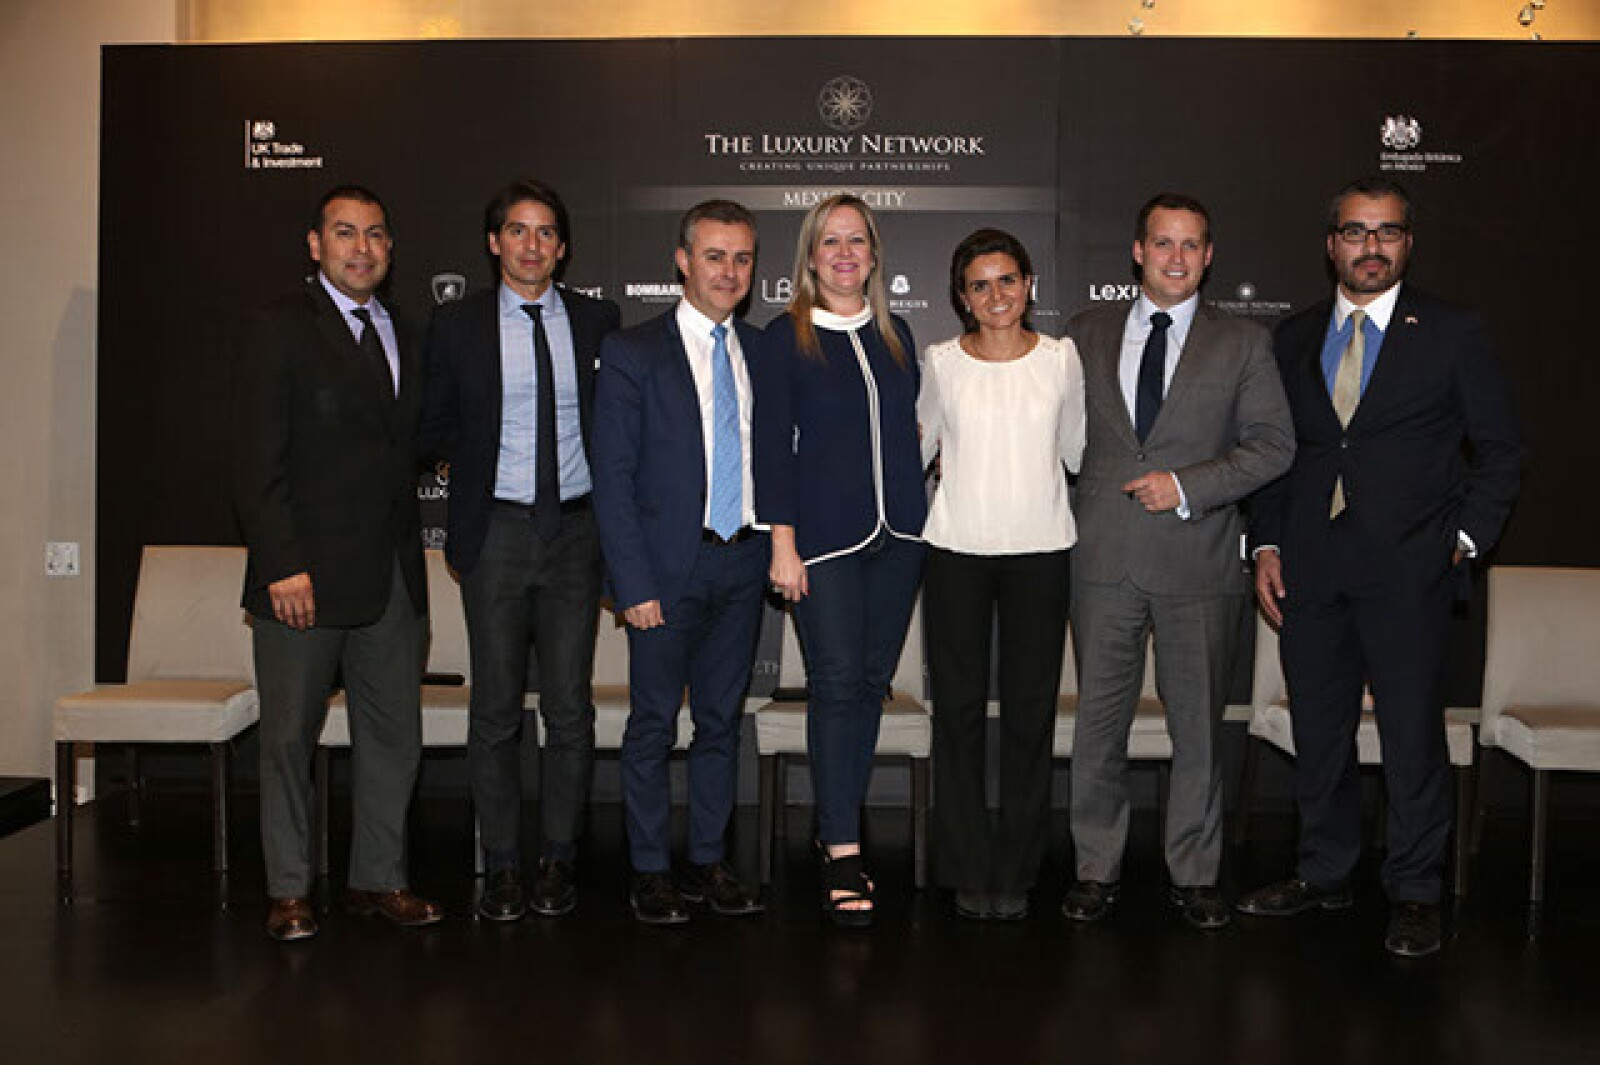 Héctor Ávila,Abelardo Marcondes,Jon Scooter,Yolanda Ruiz,Ingrid de Barrios,Chris Maskell,José Luis Rodríguez